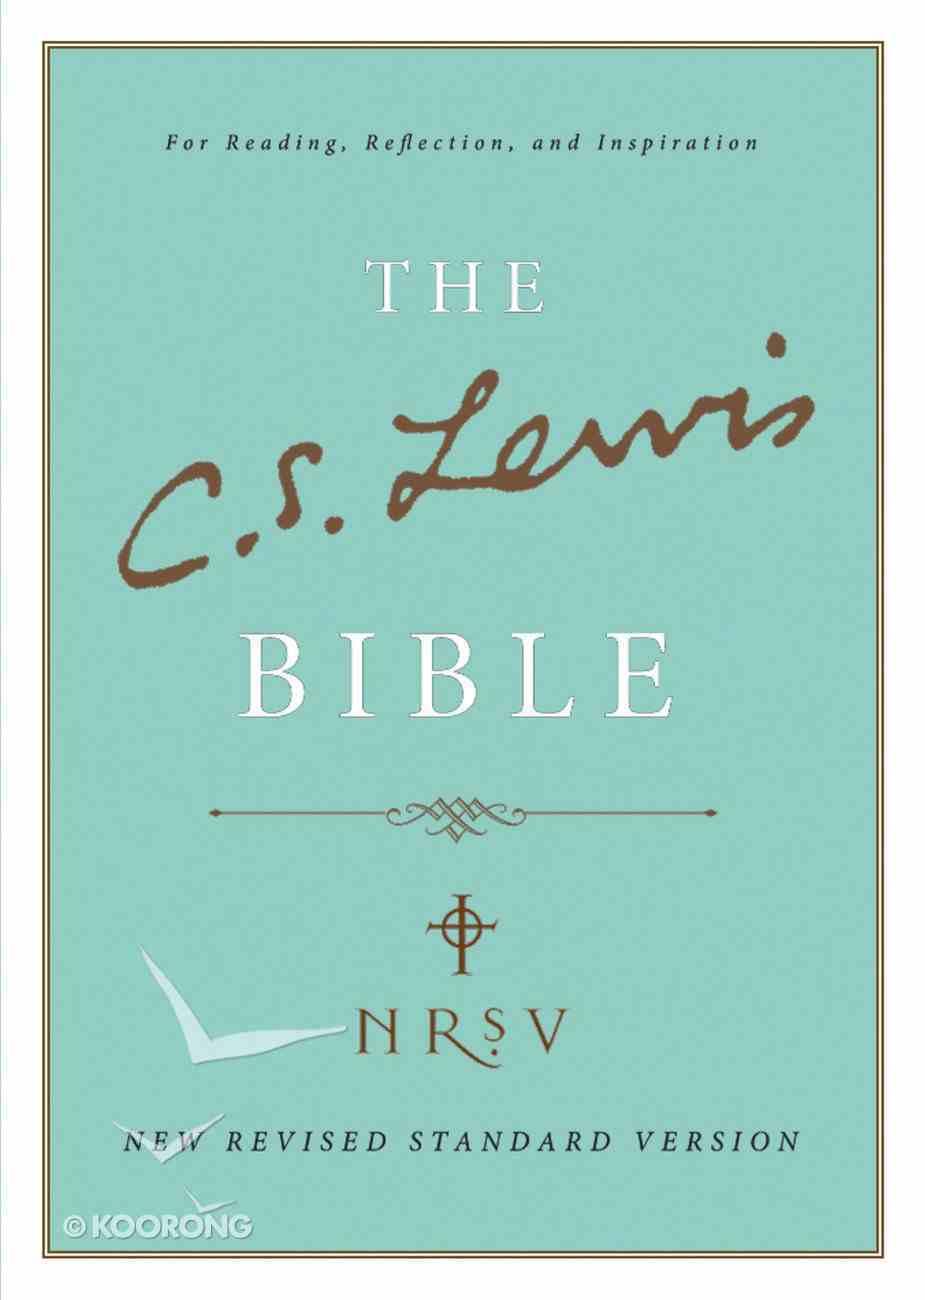 NRSV C S Lewis Bible eBook